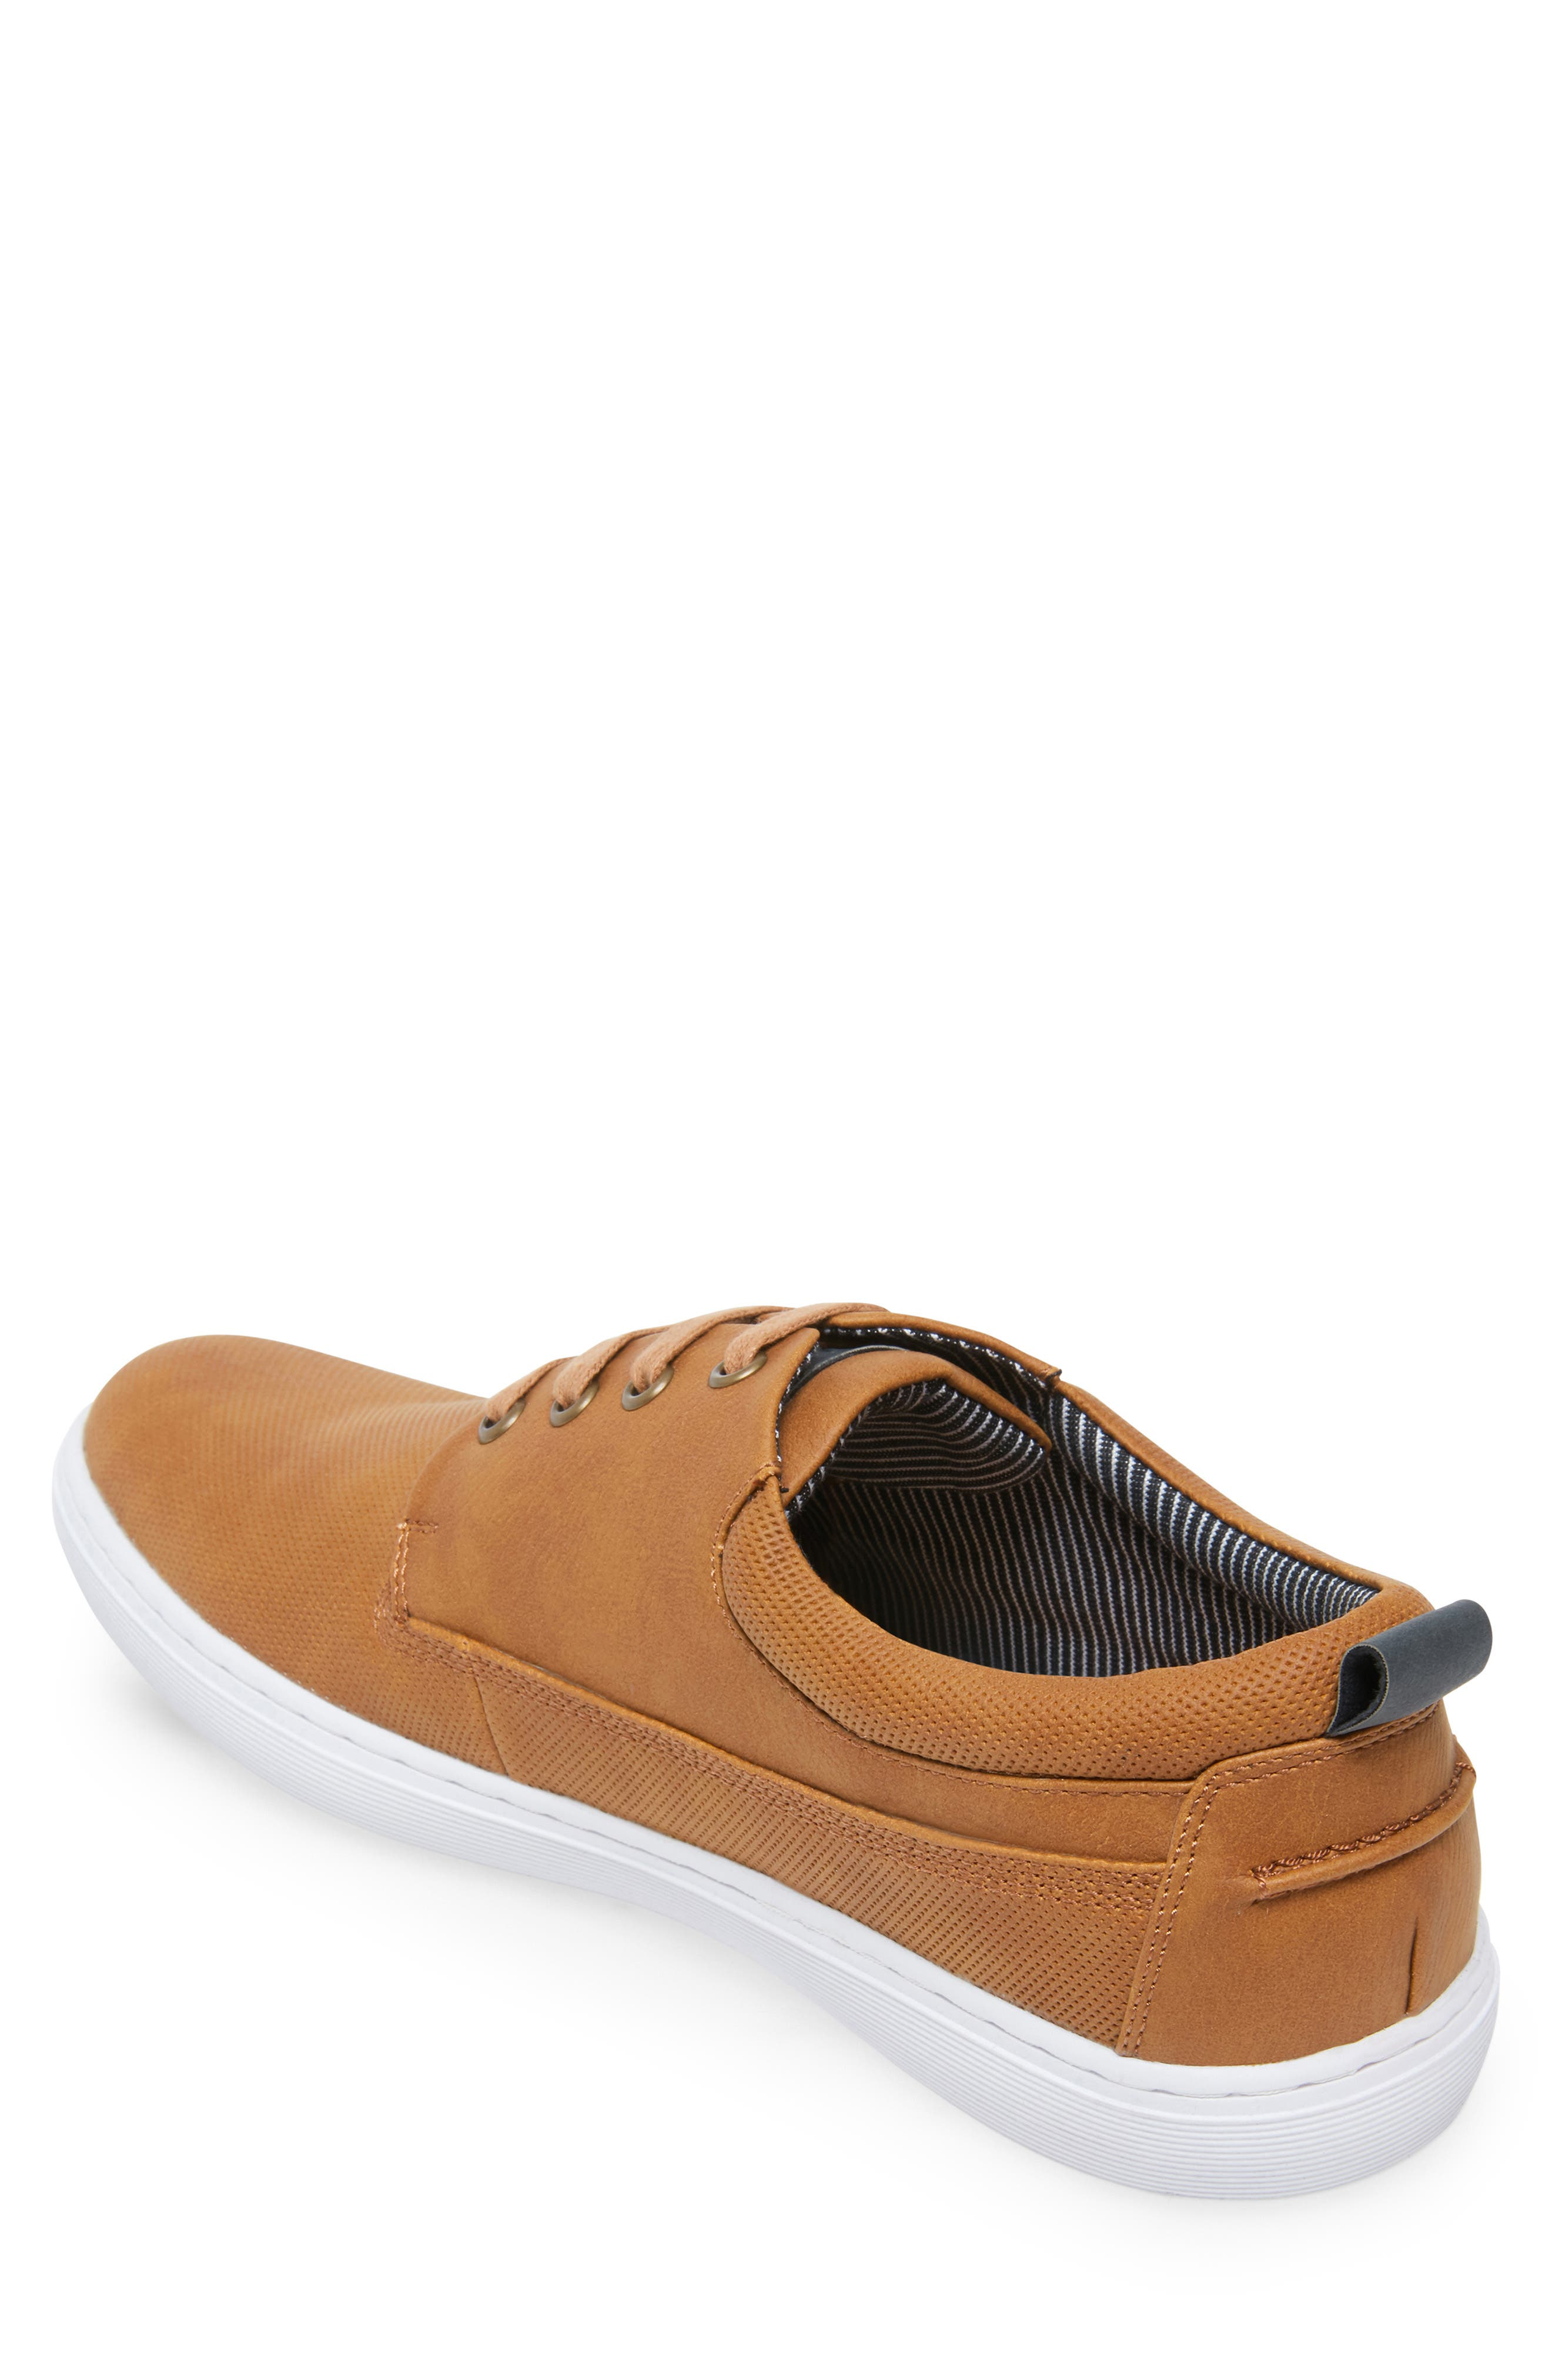 Halliday Sneaker,                             Alternate thumbnail 2, color,                             COGNAC